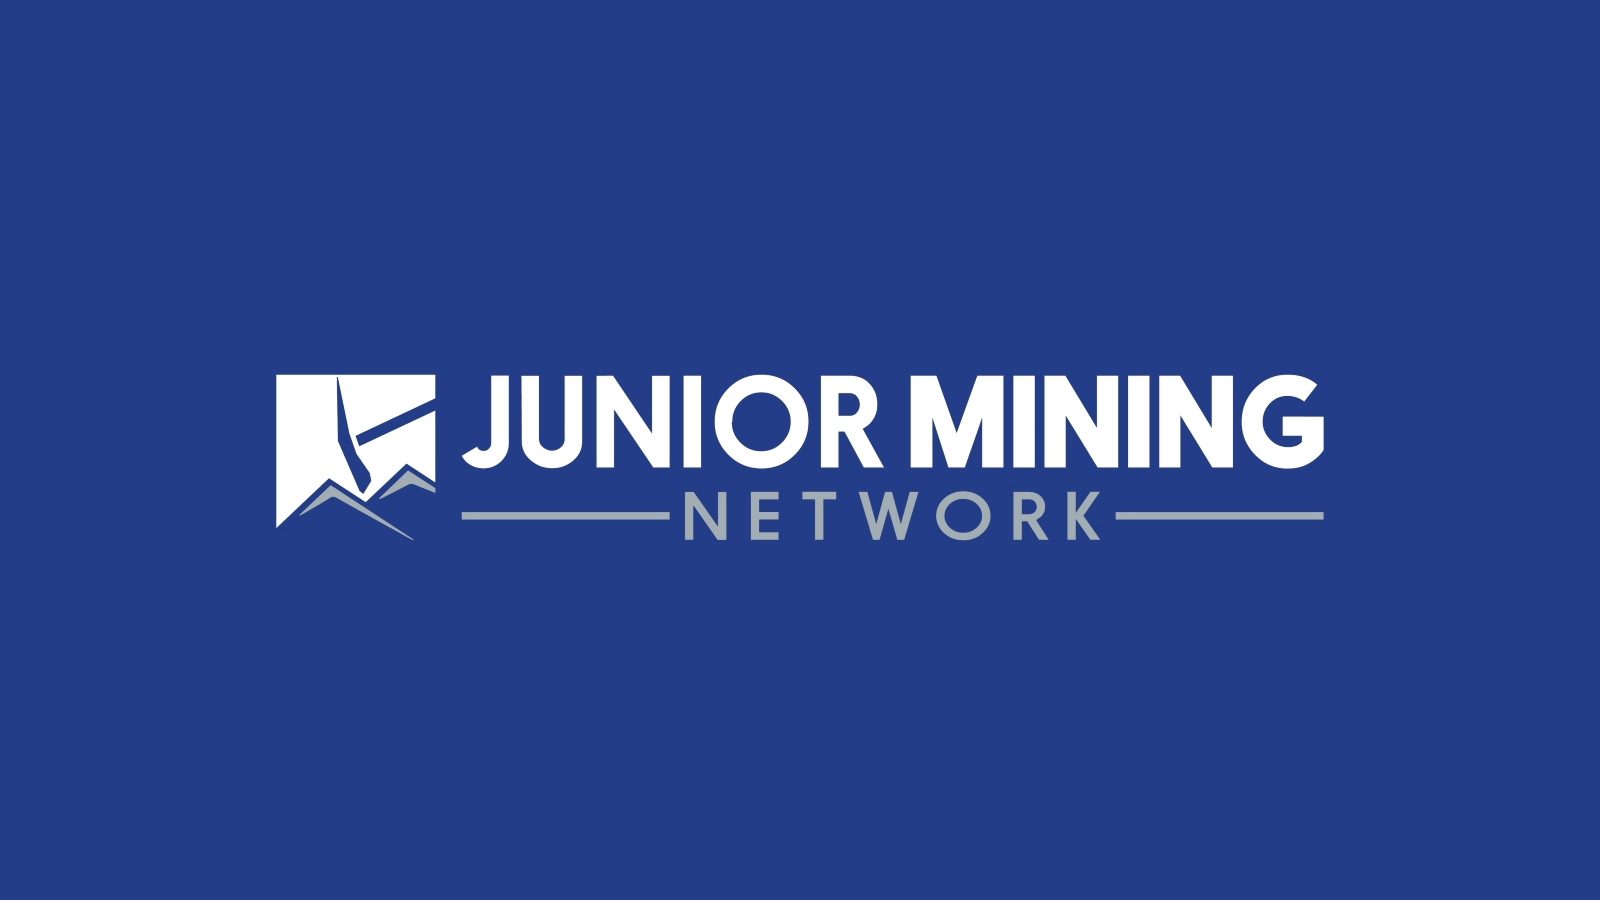 c9ce3ee1772c Puma Exploration Drills 405 Meters of 3.30% Zinc at Murray Brook ...